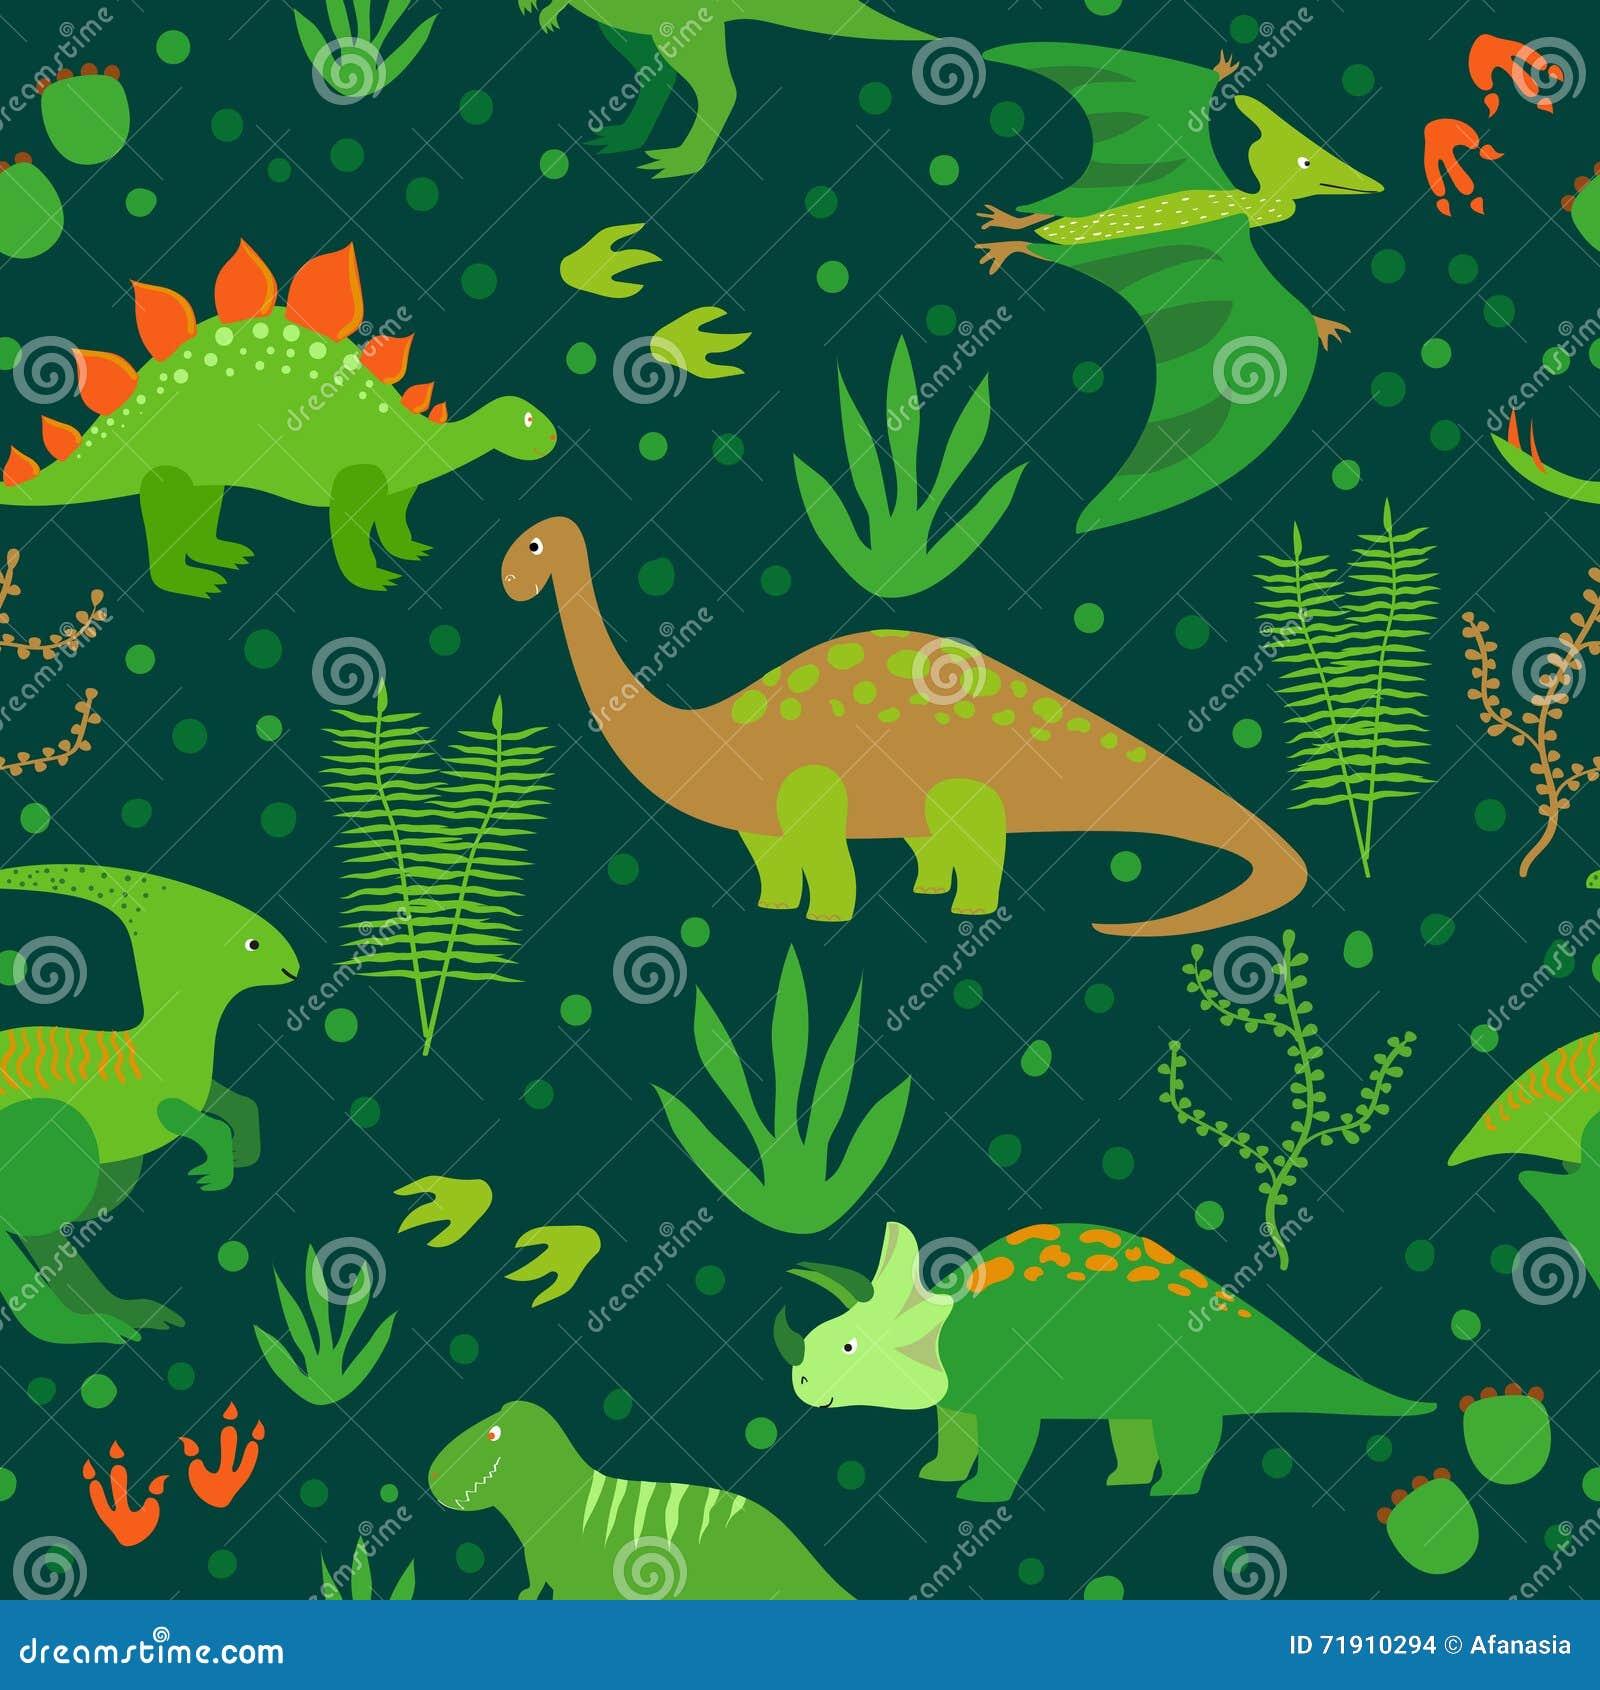 Cute Dinosaurs Seamless Pattern Stock Vector